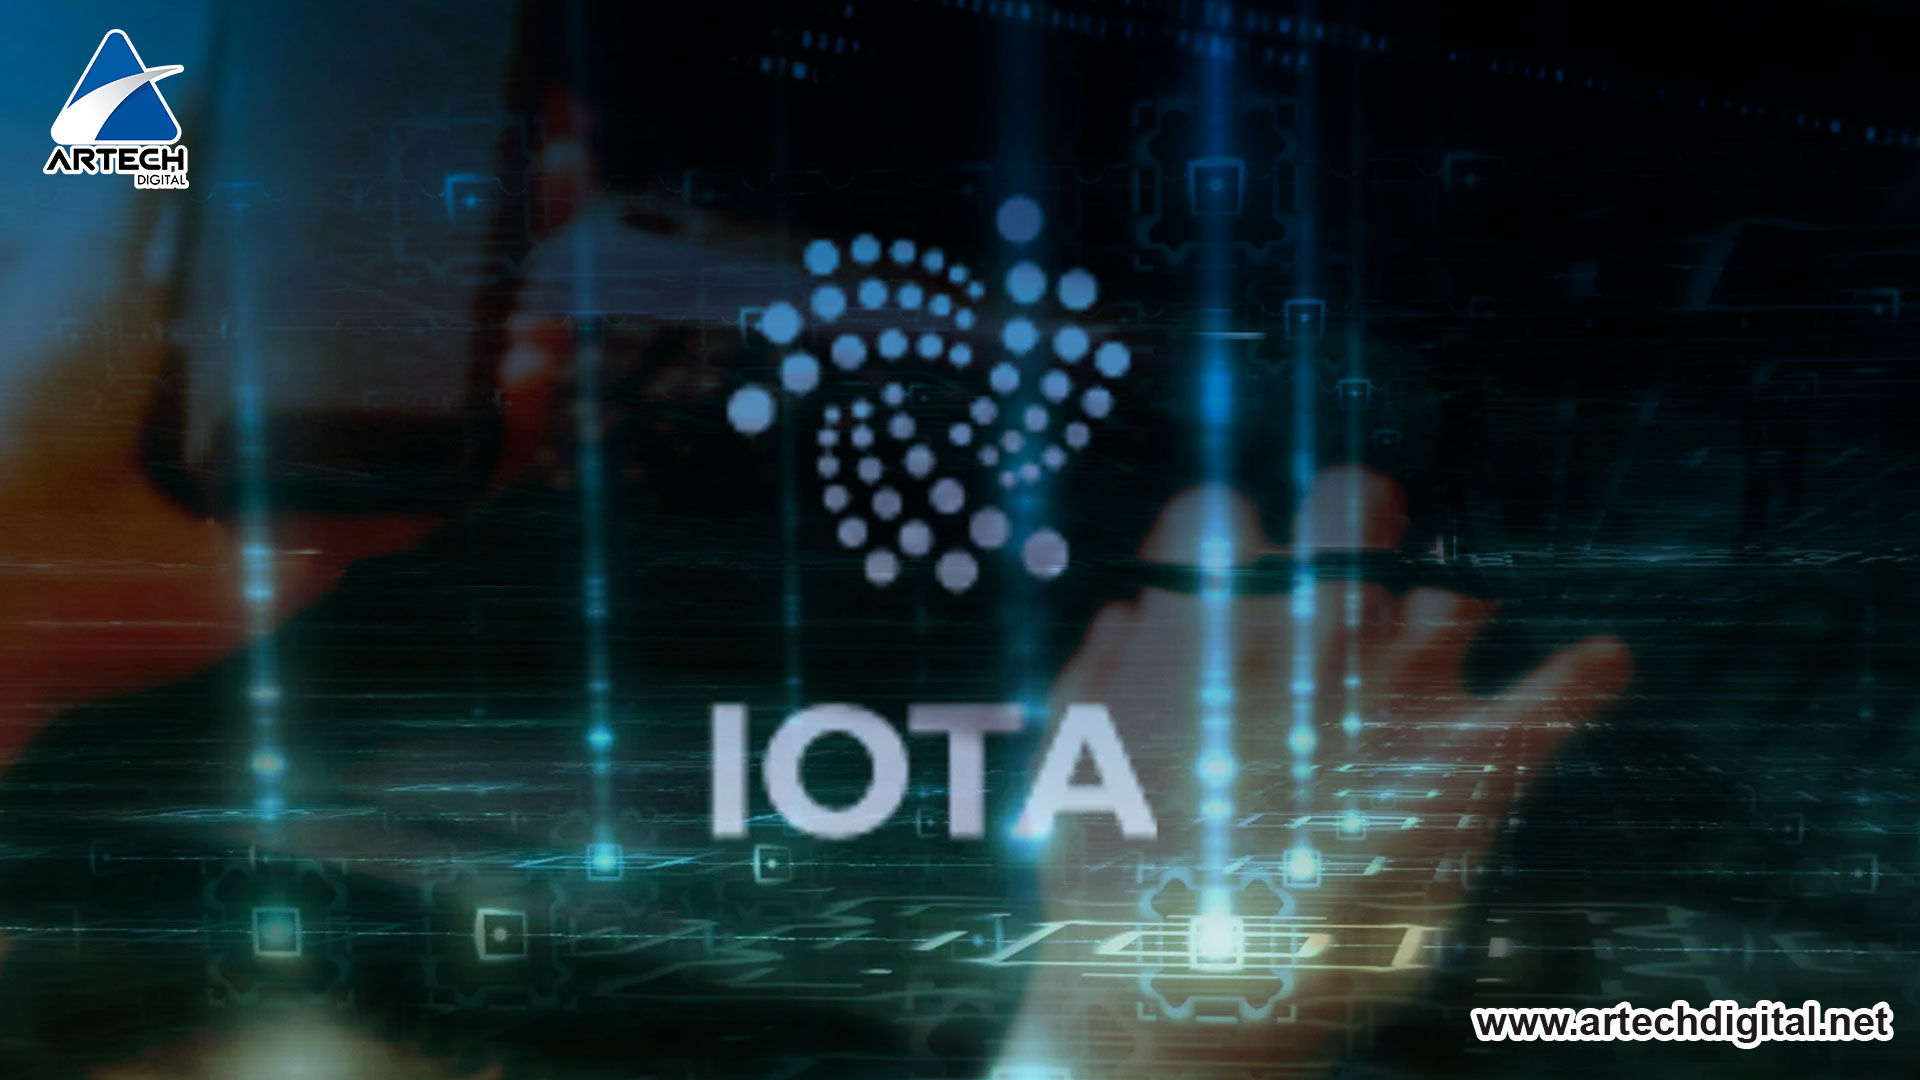 Sube el valor de IOTA - IOTA Latino